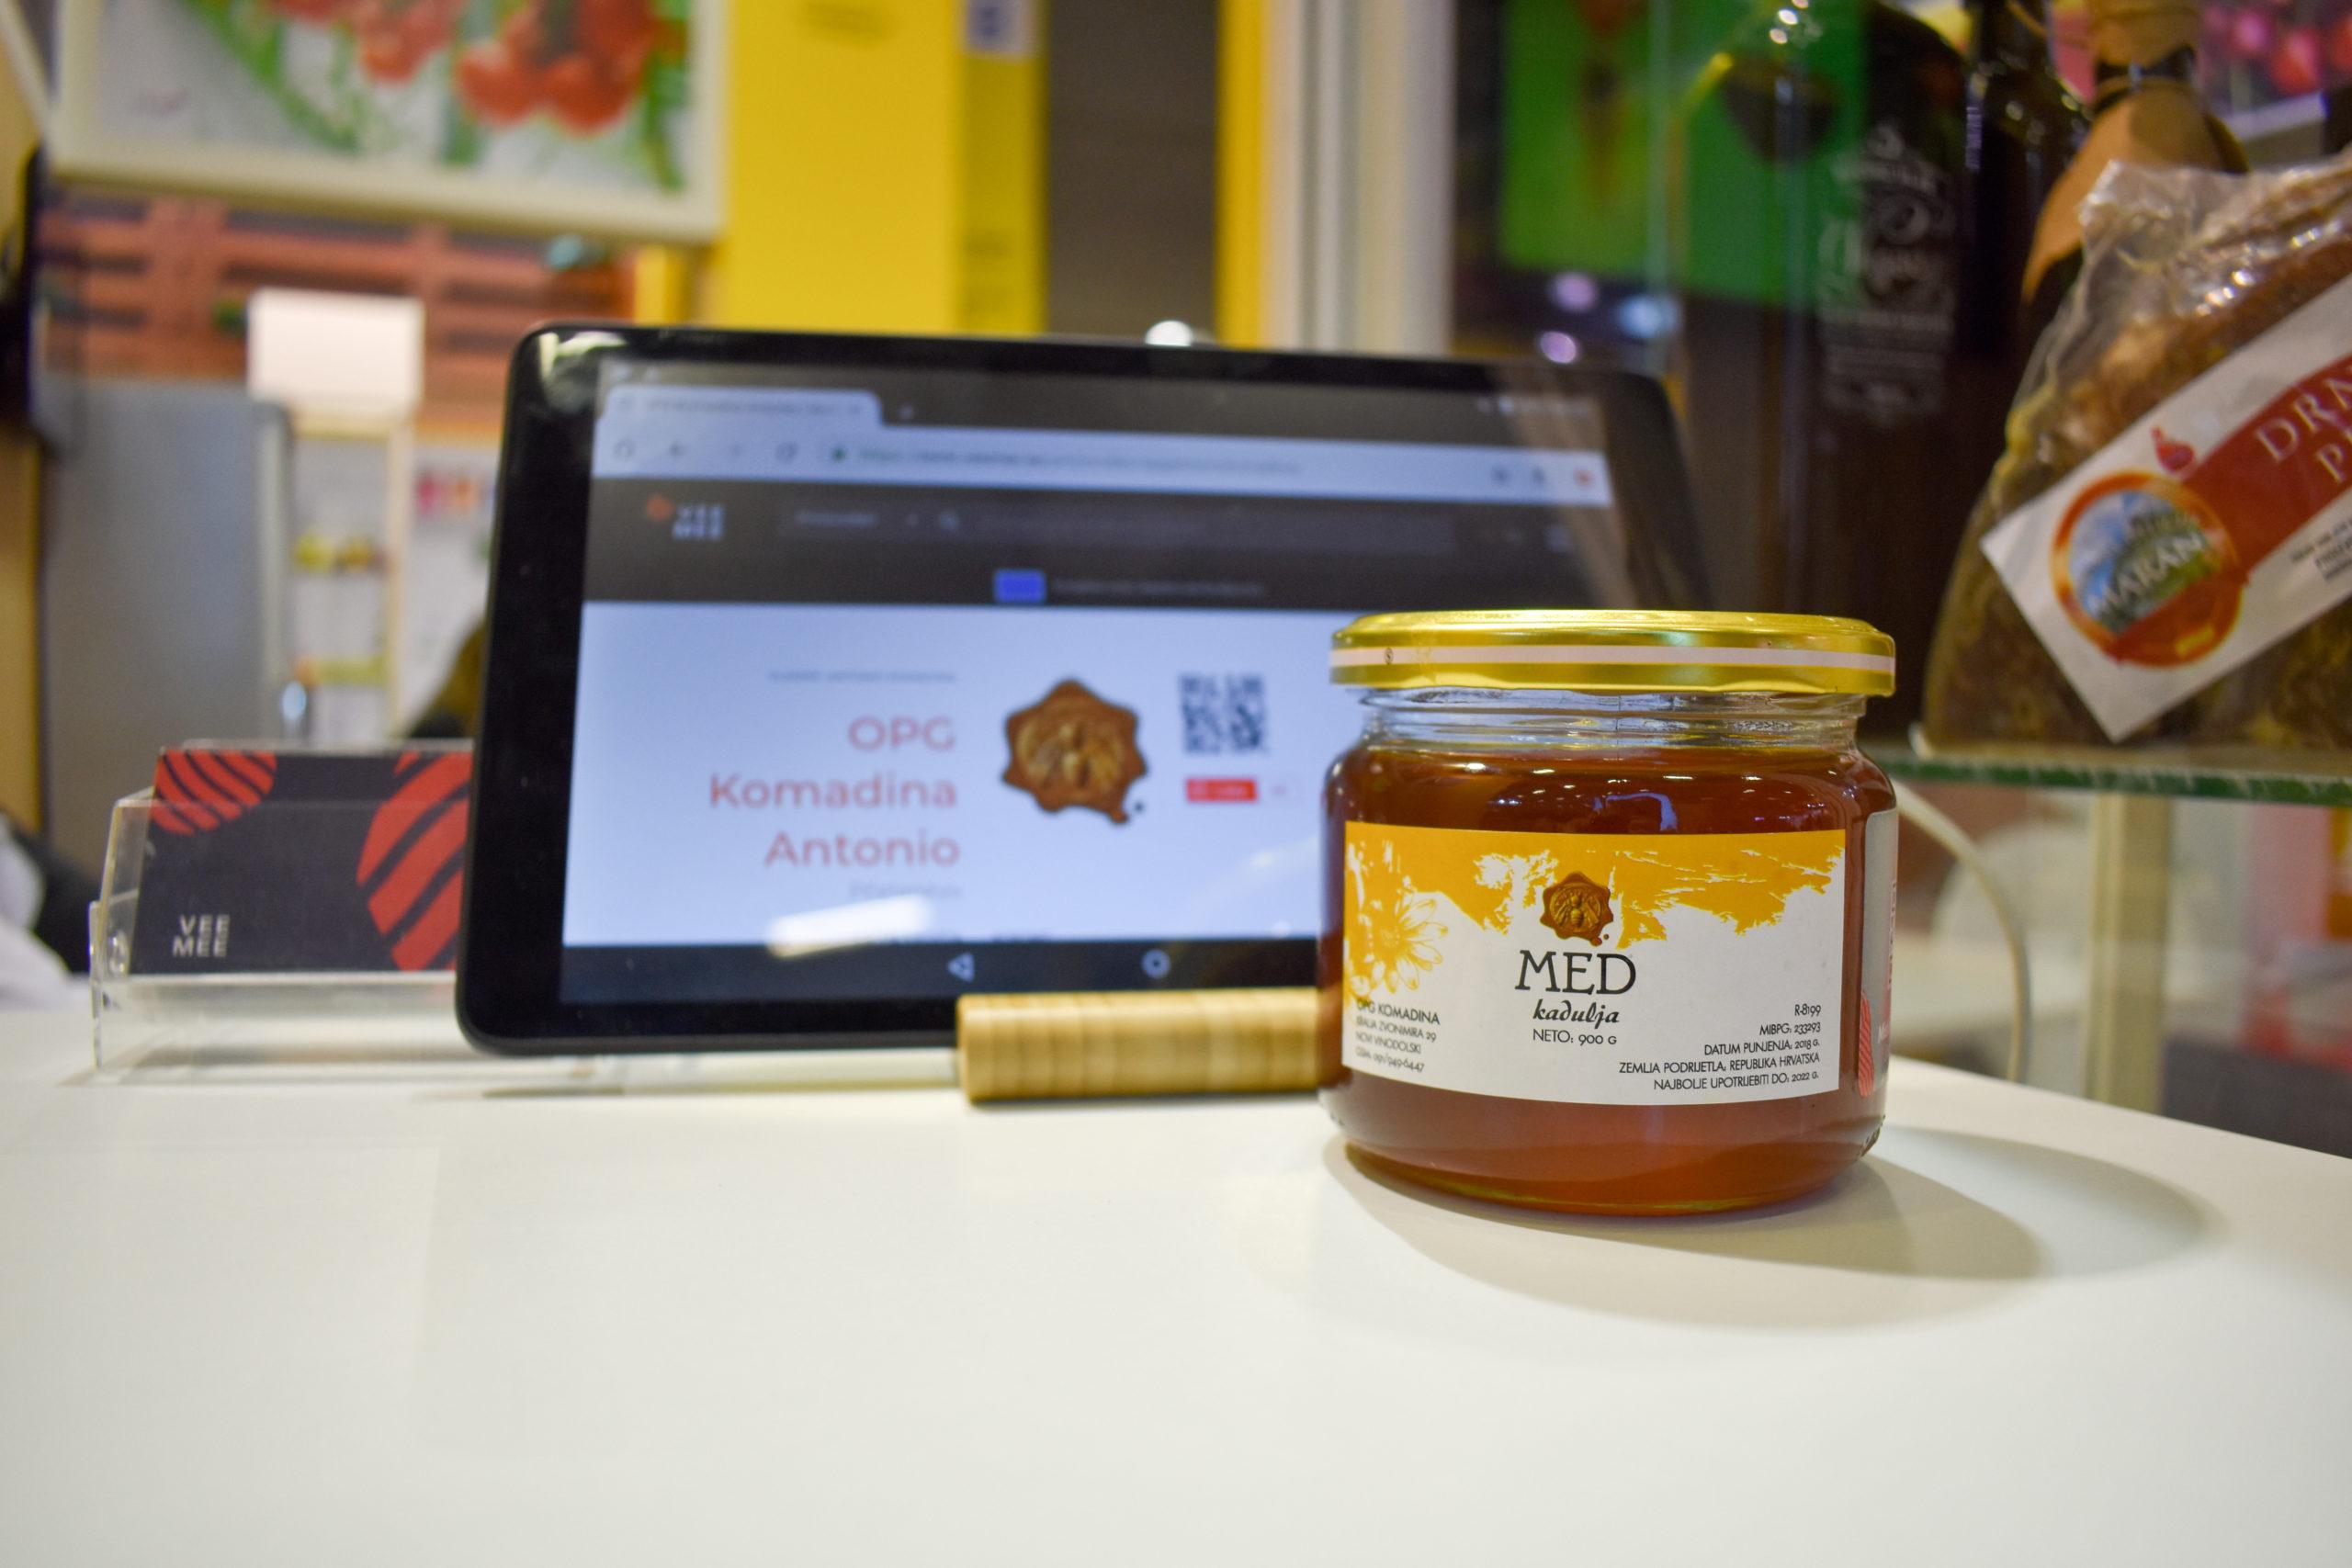 Fruit Logistica 2020. - OPG Komadina Antonio